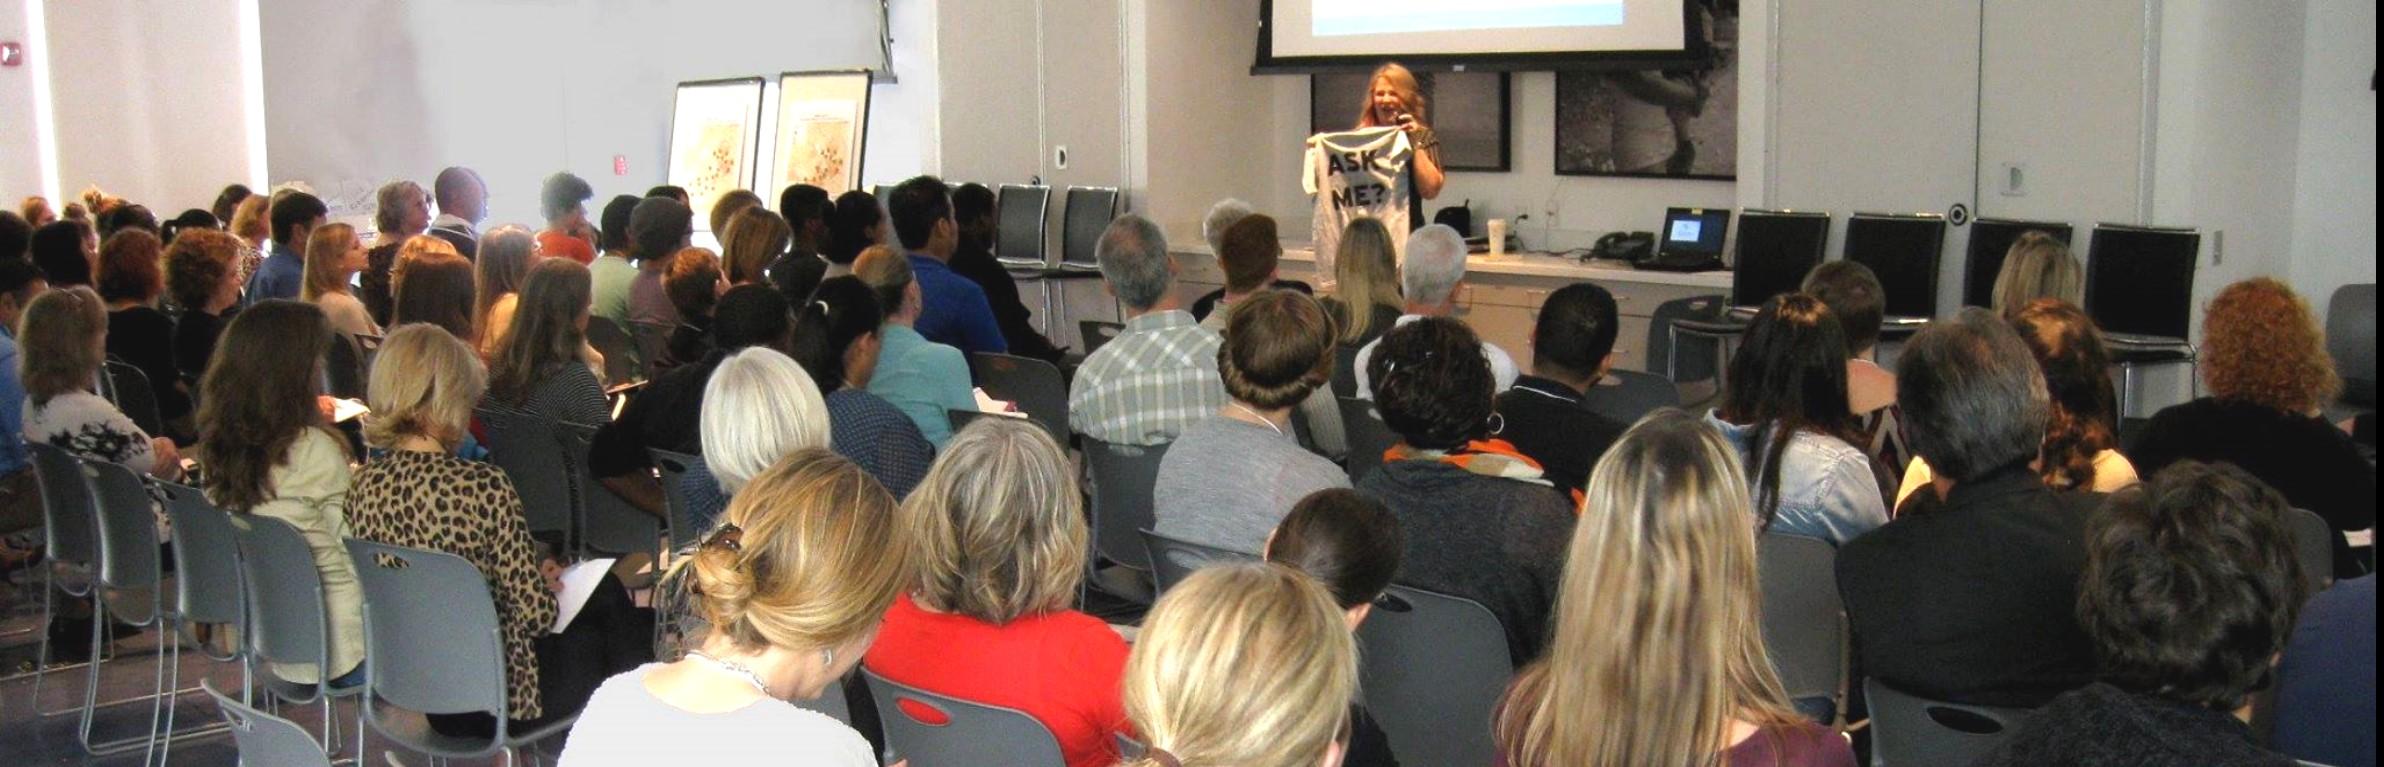 YSAPC Prevention Summit - November 5, 2015